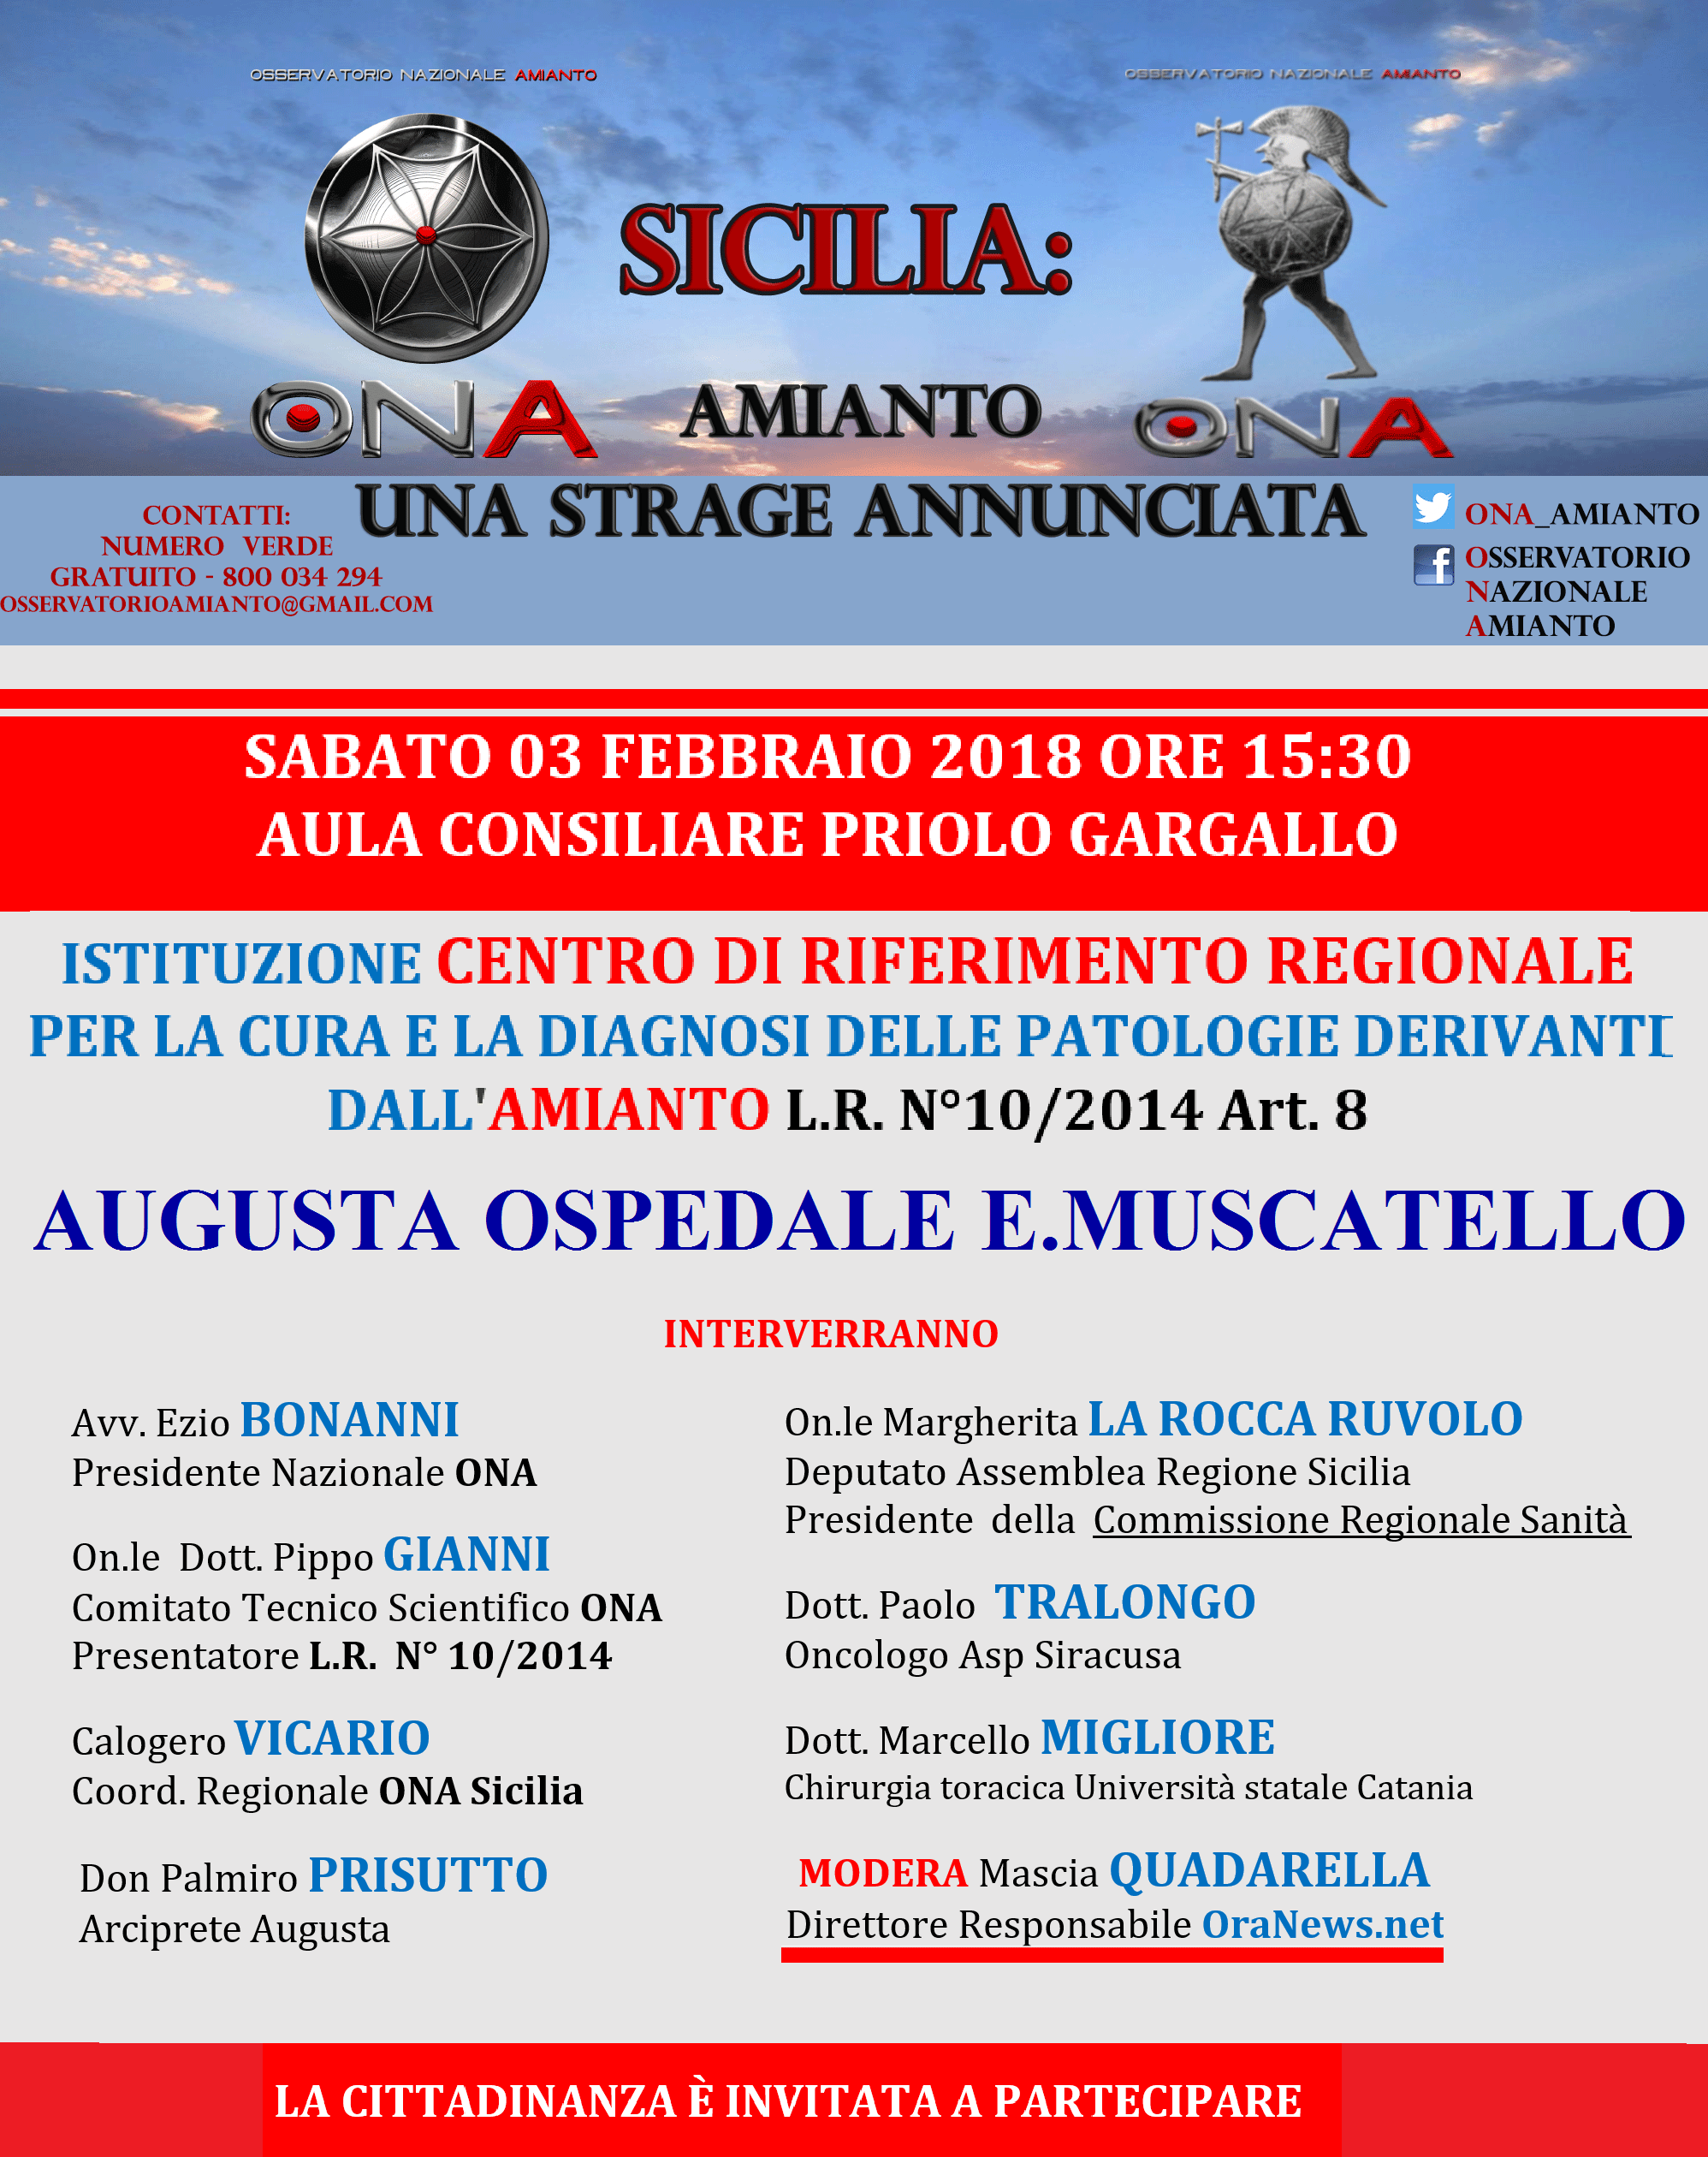 LOCANDINA ONA Sicilia 3 febbraio 2018